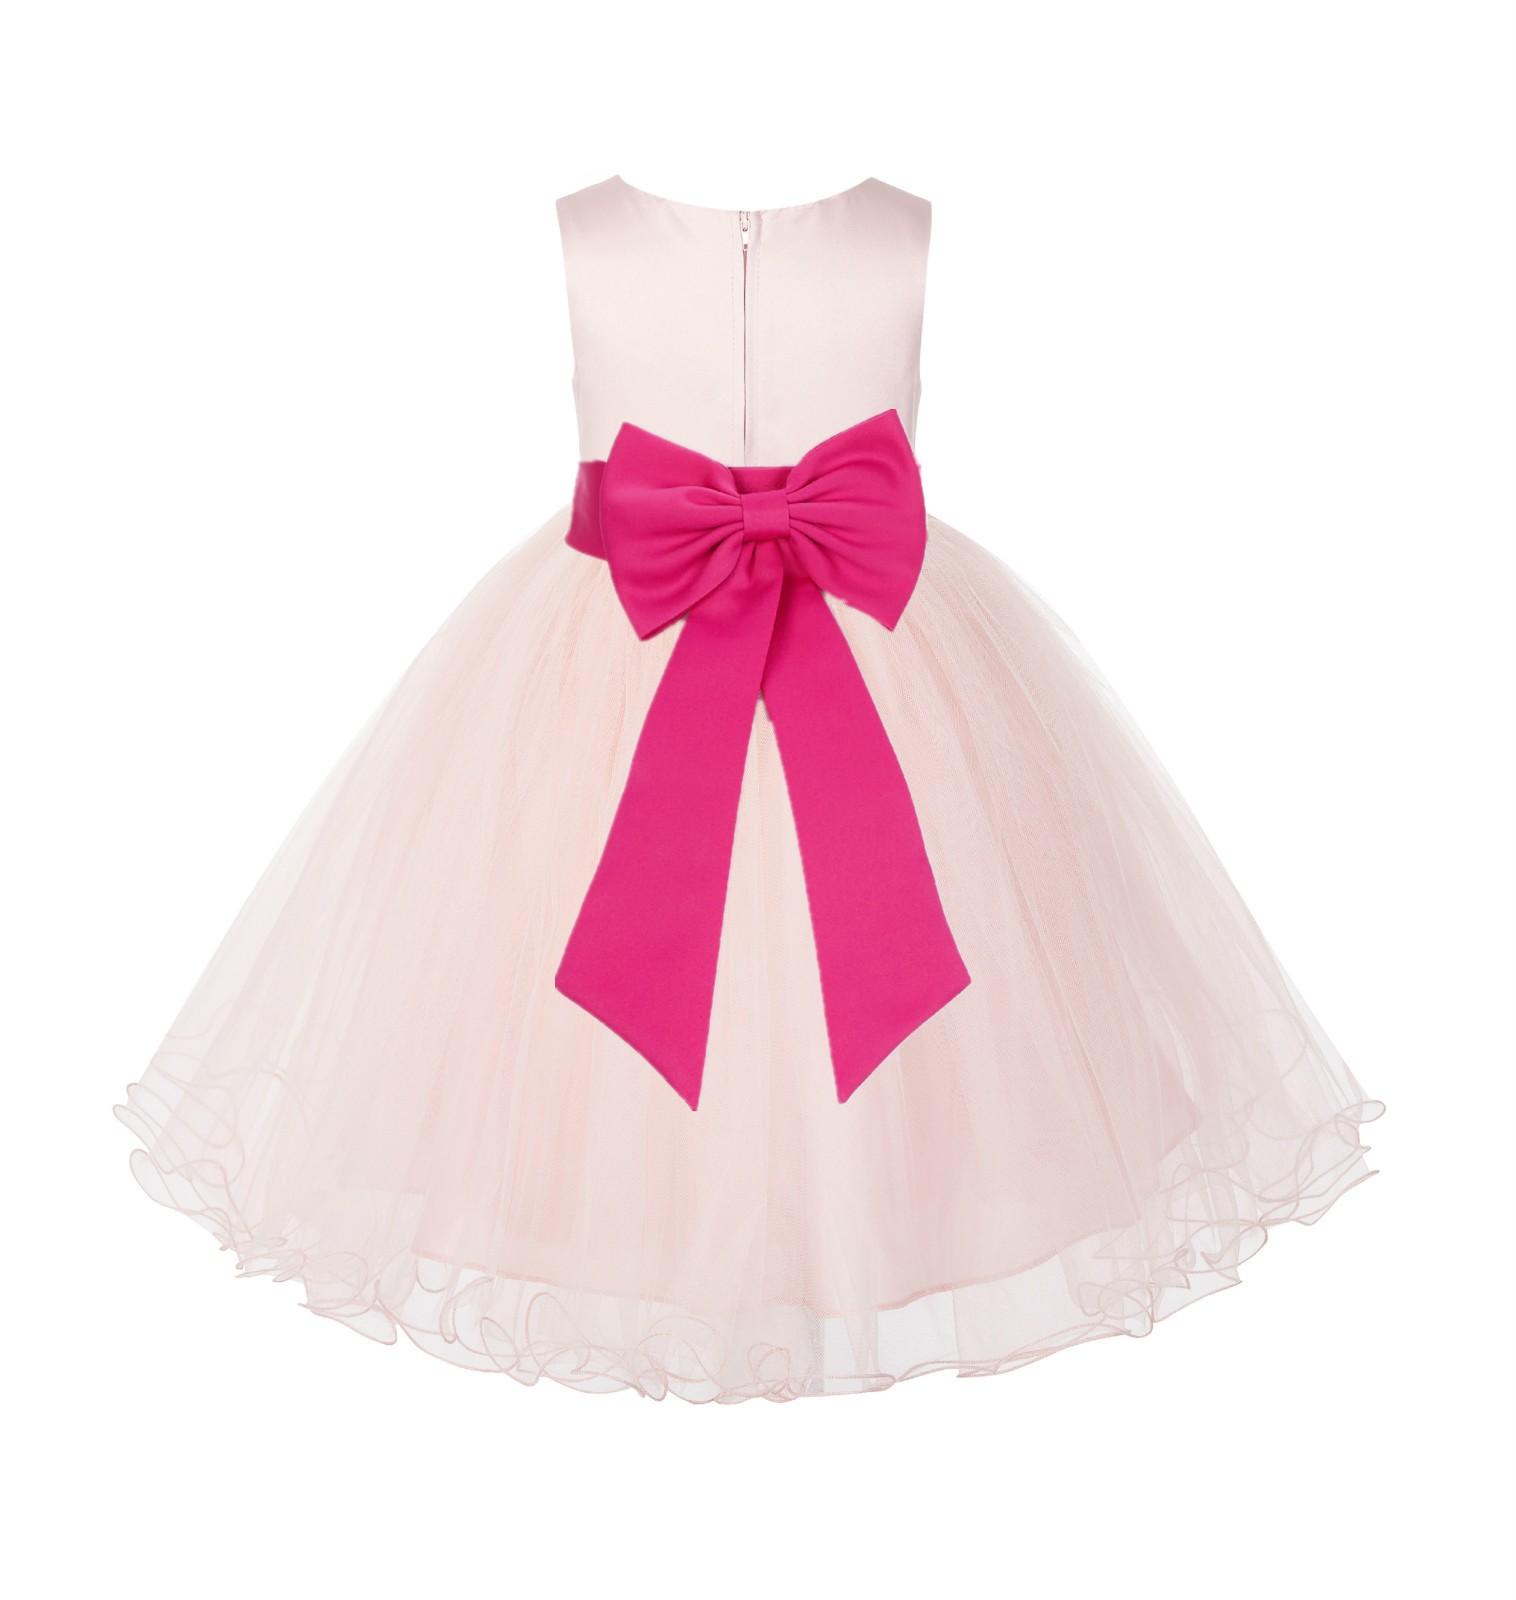 Blush PInk / Fuchsia Tulle Rattail Edge Flower Girl Dress Wedding Bridesmaid 829T